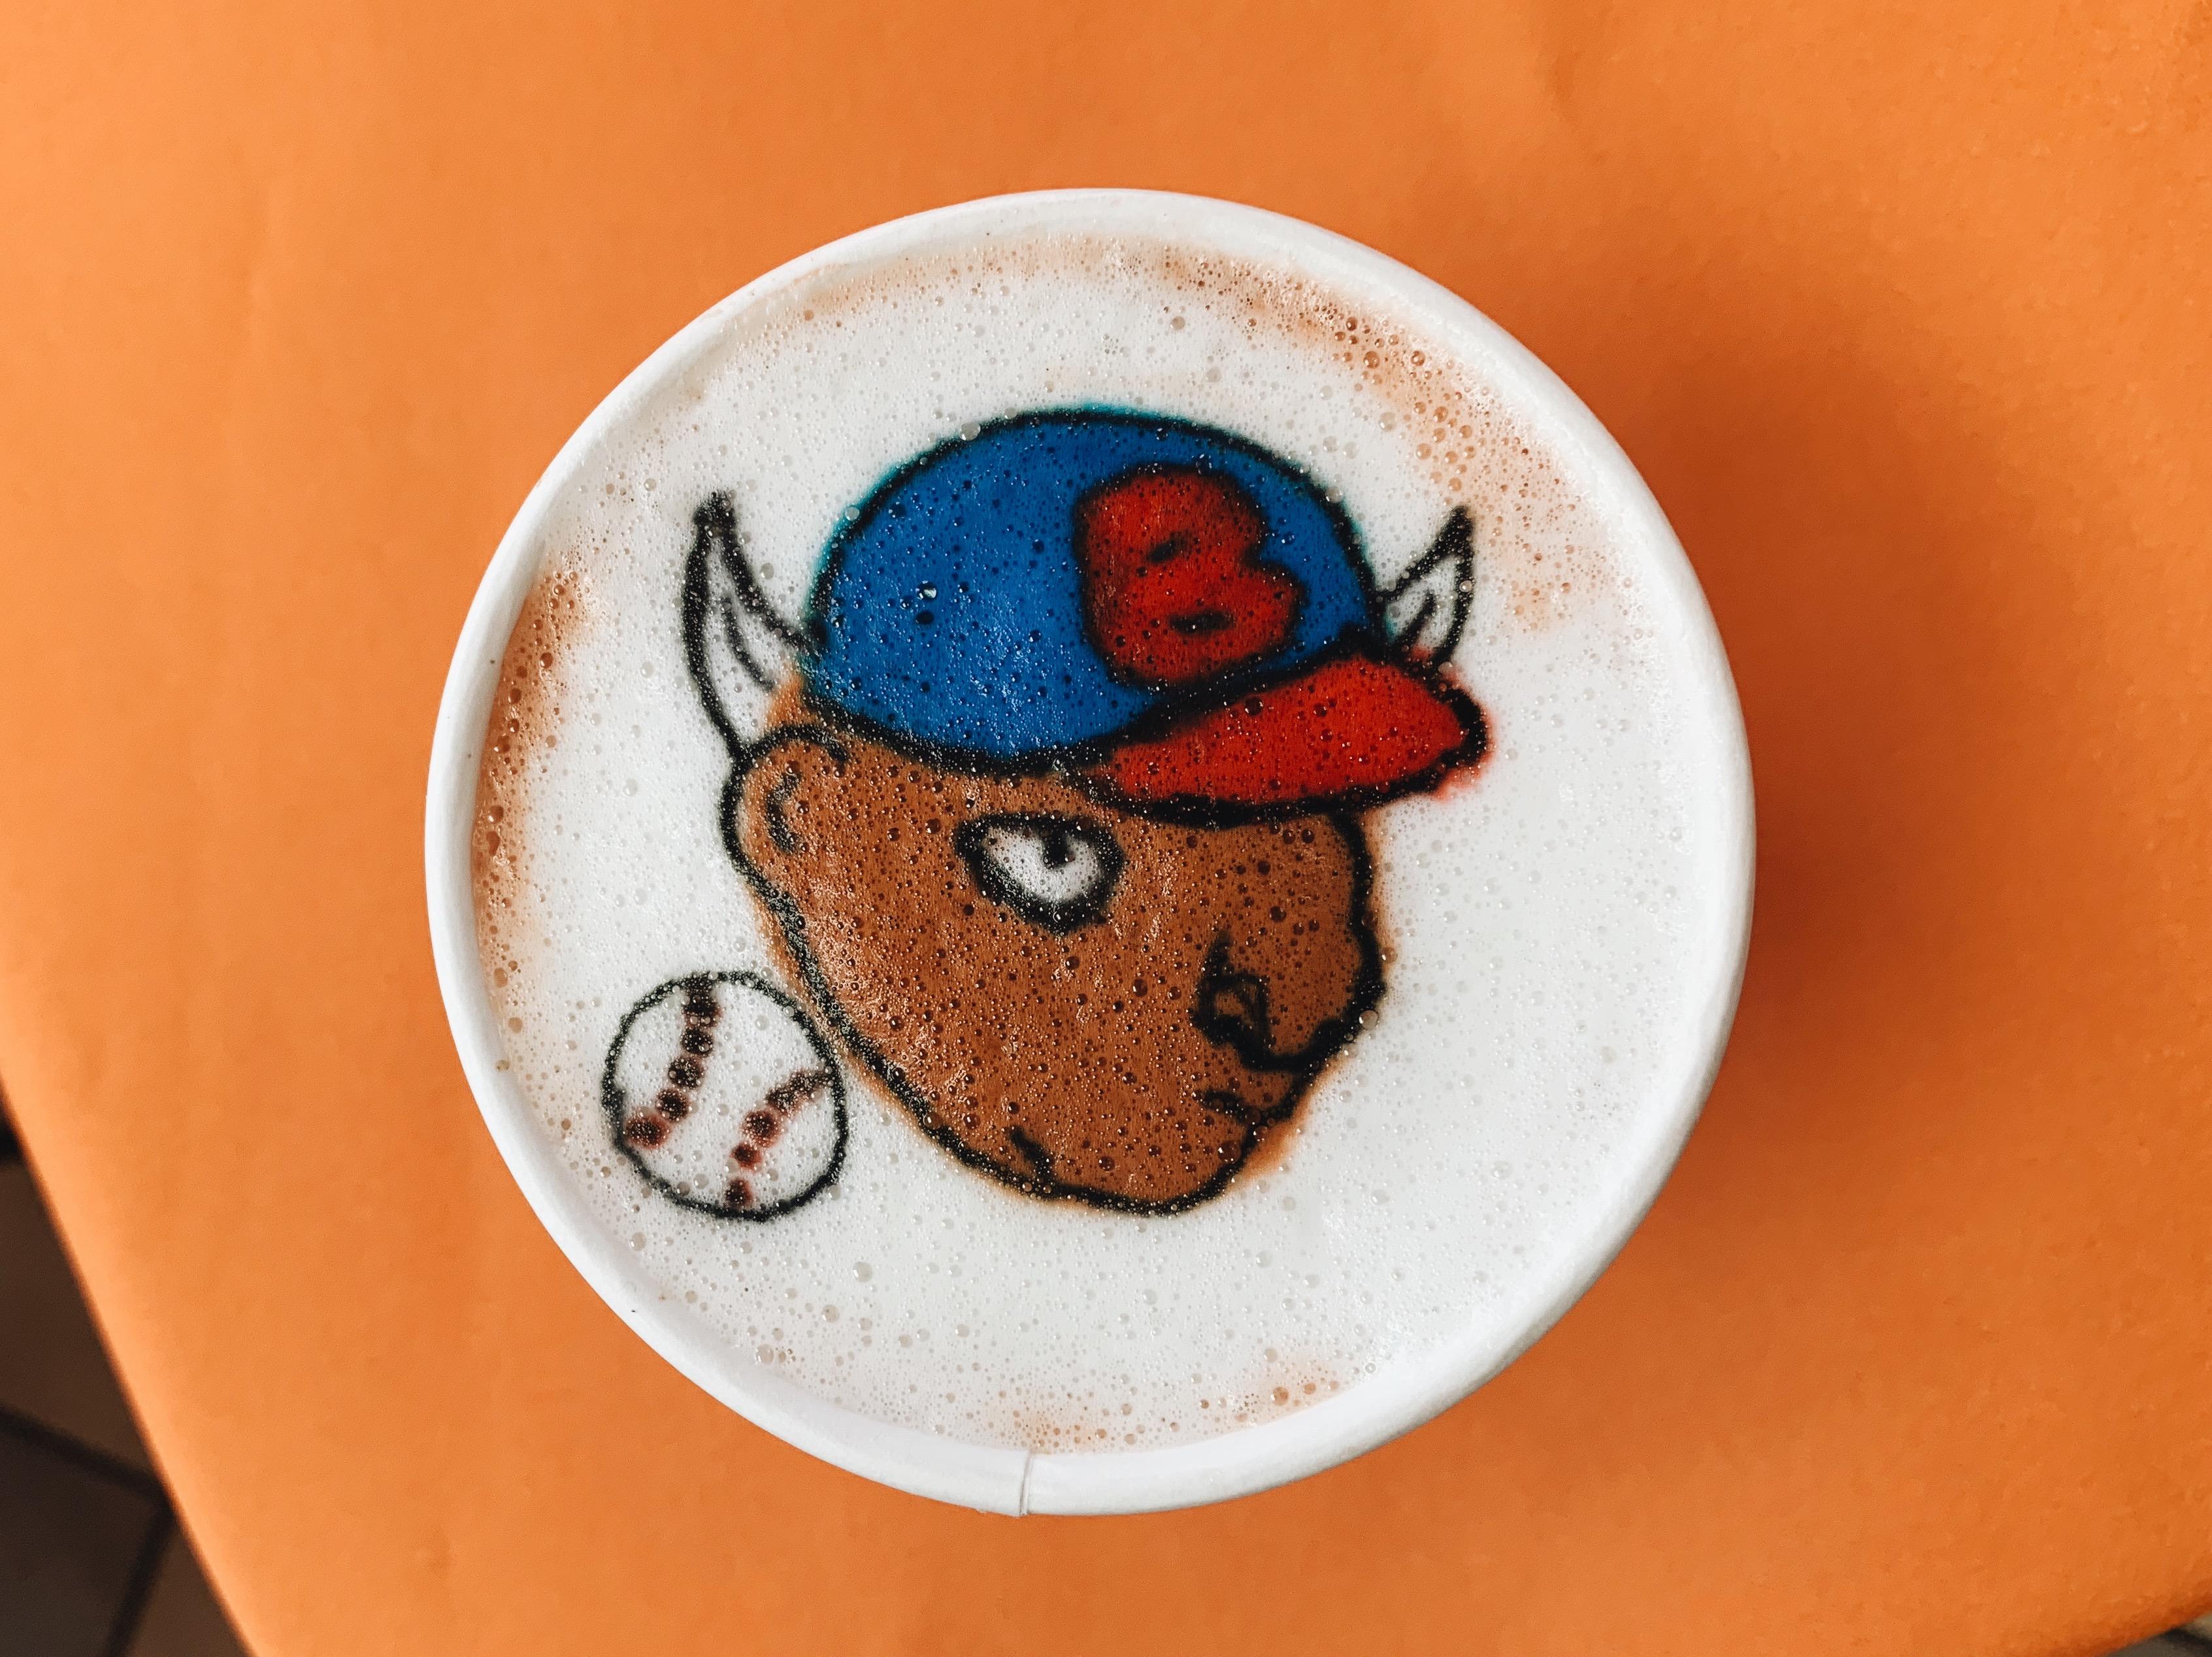 Michael Breach, a latte artist, created a familiar face in a Dunkin Donuts latte in Niagara Falls.